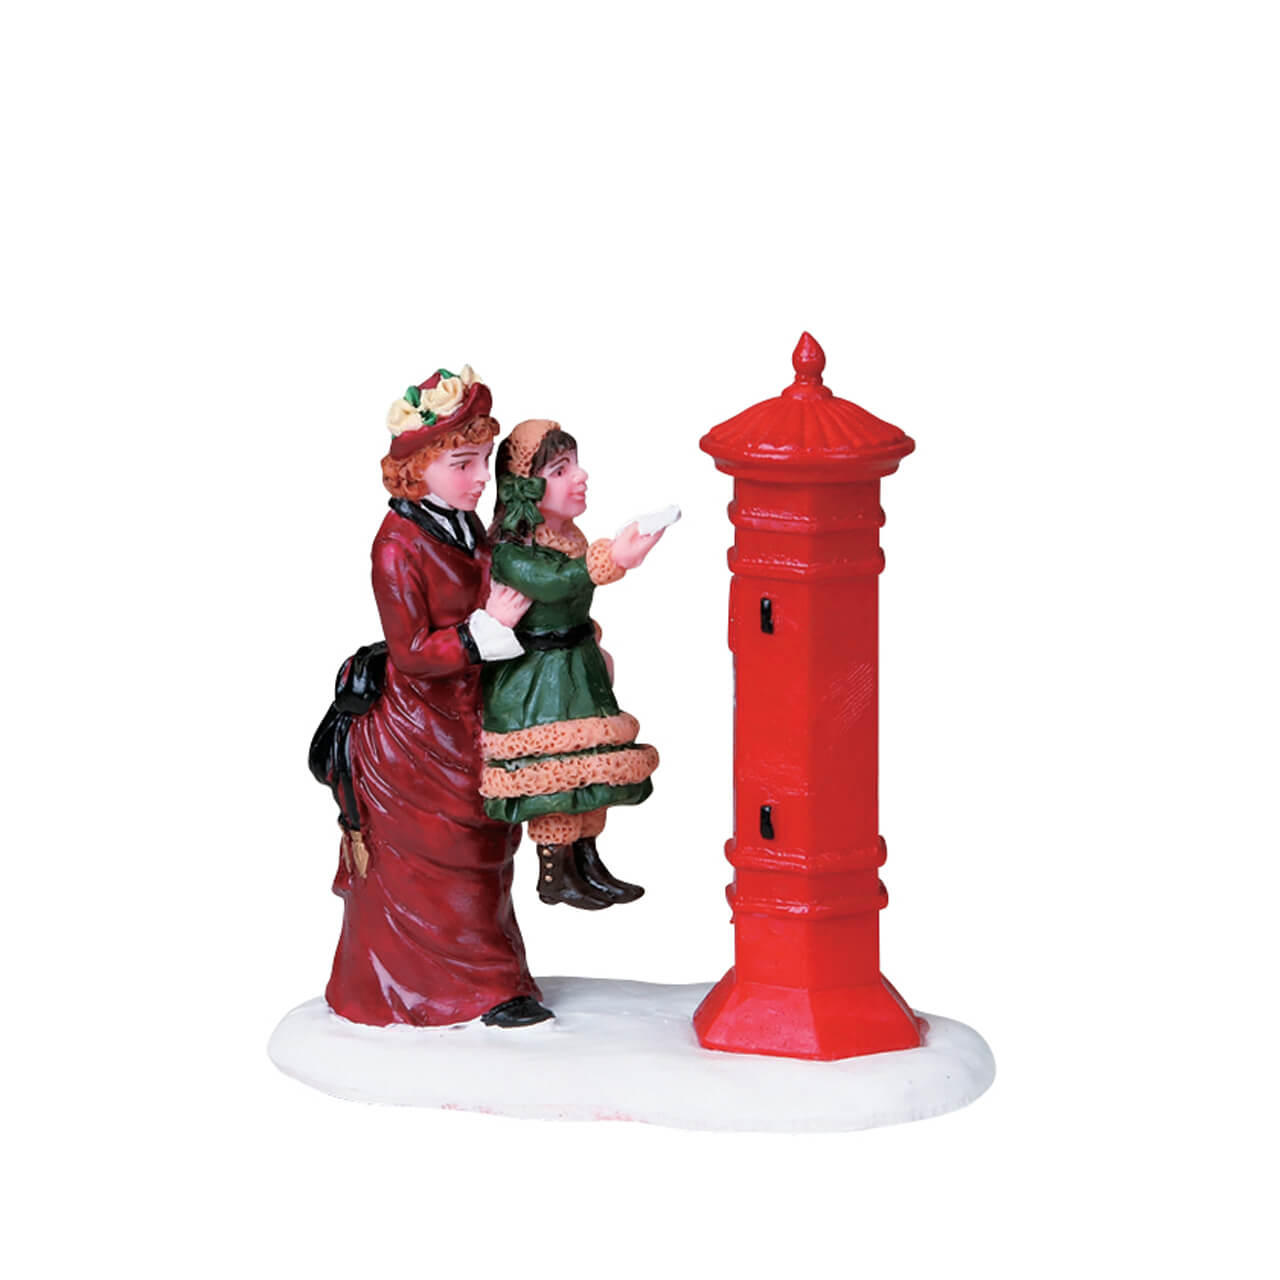 Lemax Christmas Village Letter to Santa